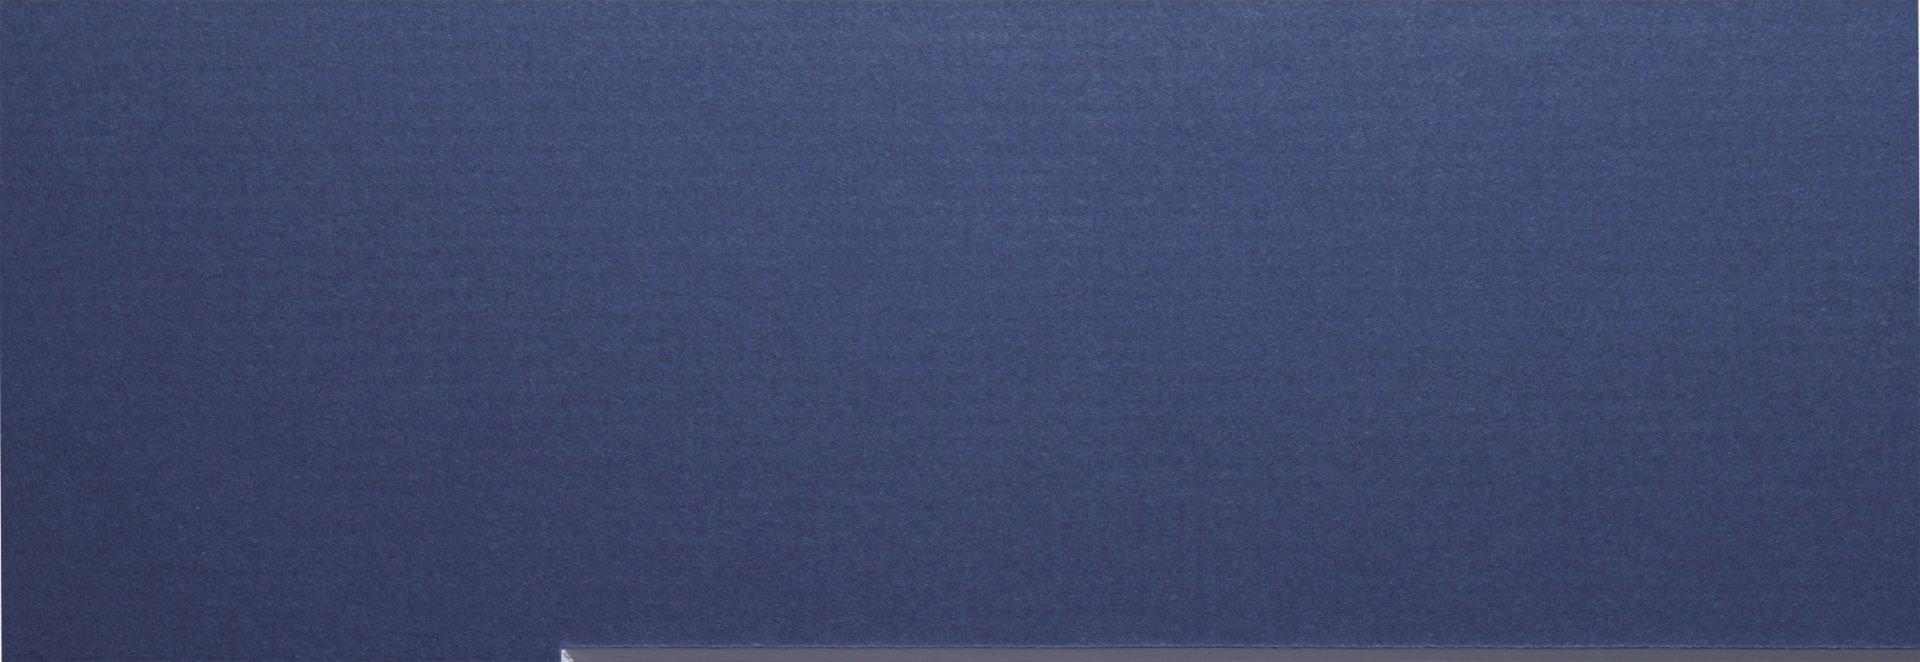 GSRM 1081 Volcano Blue